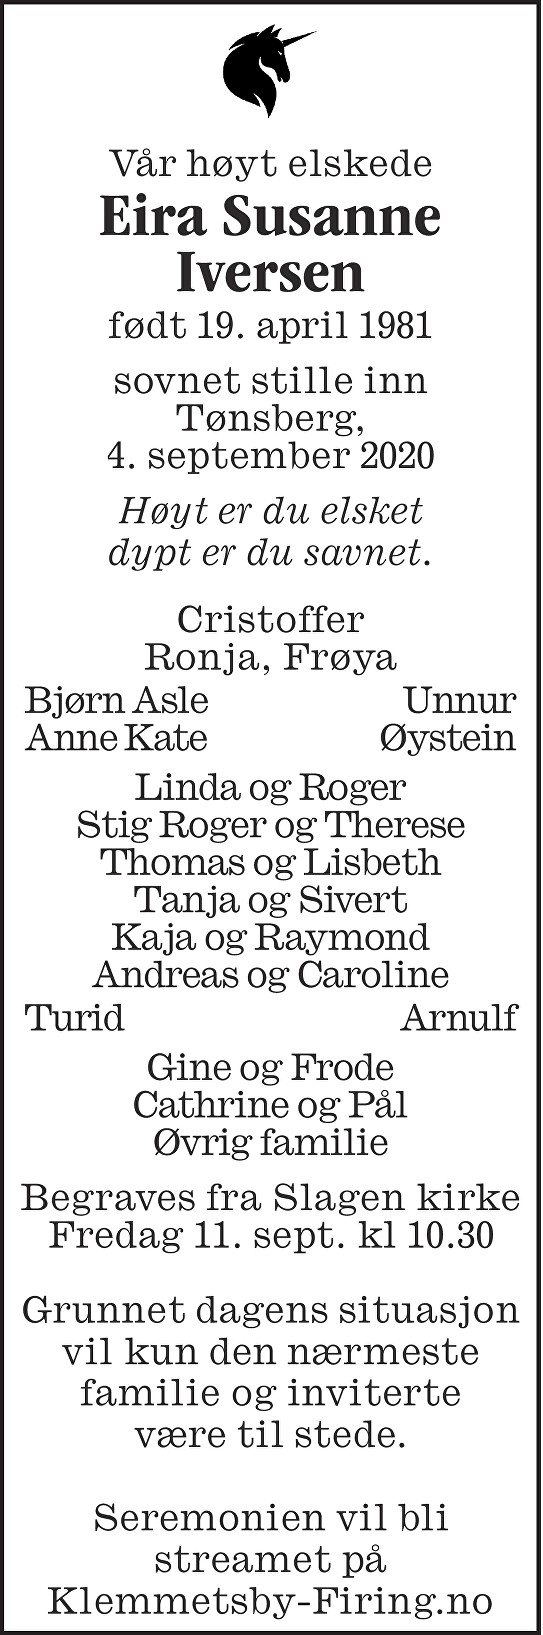 Eira Susanne Iversen Dødsannonse